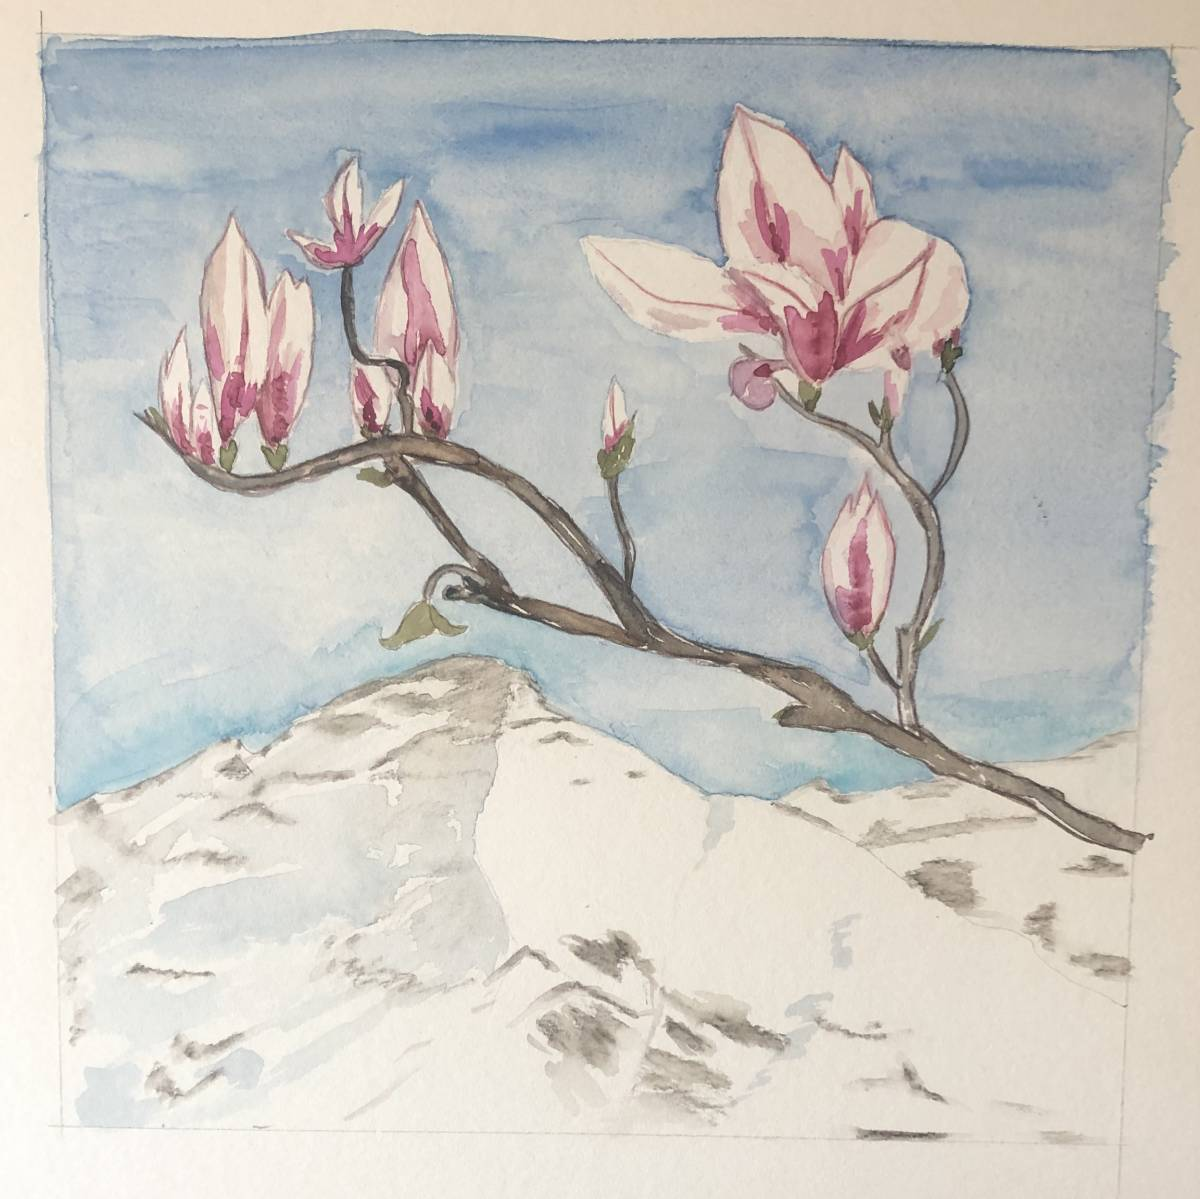 'Magnolie im Winter' von Anja Napiany